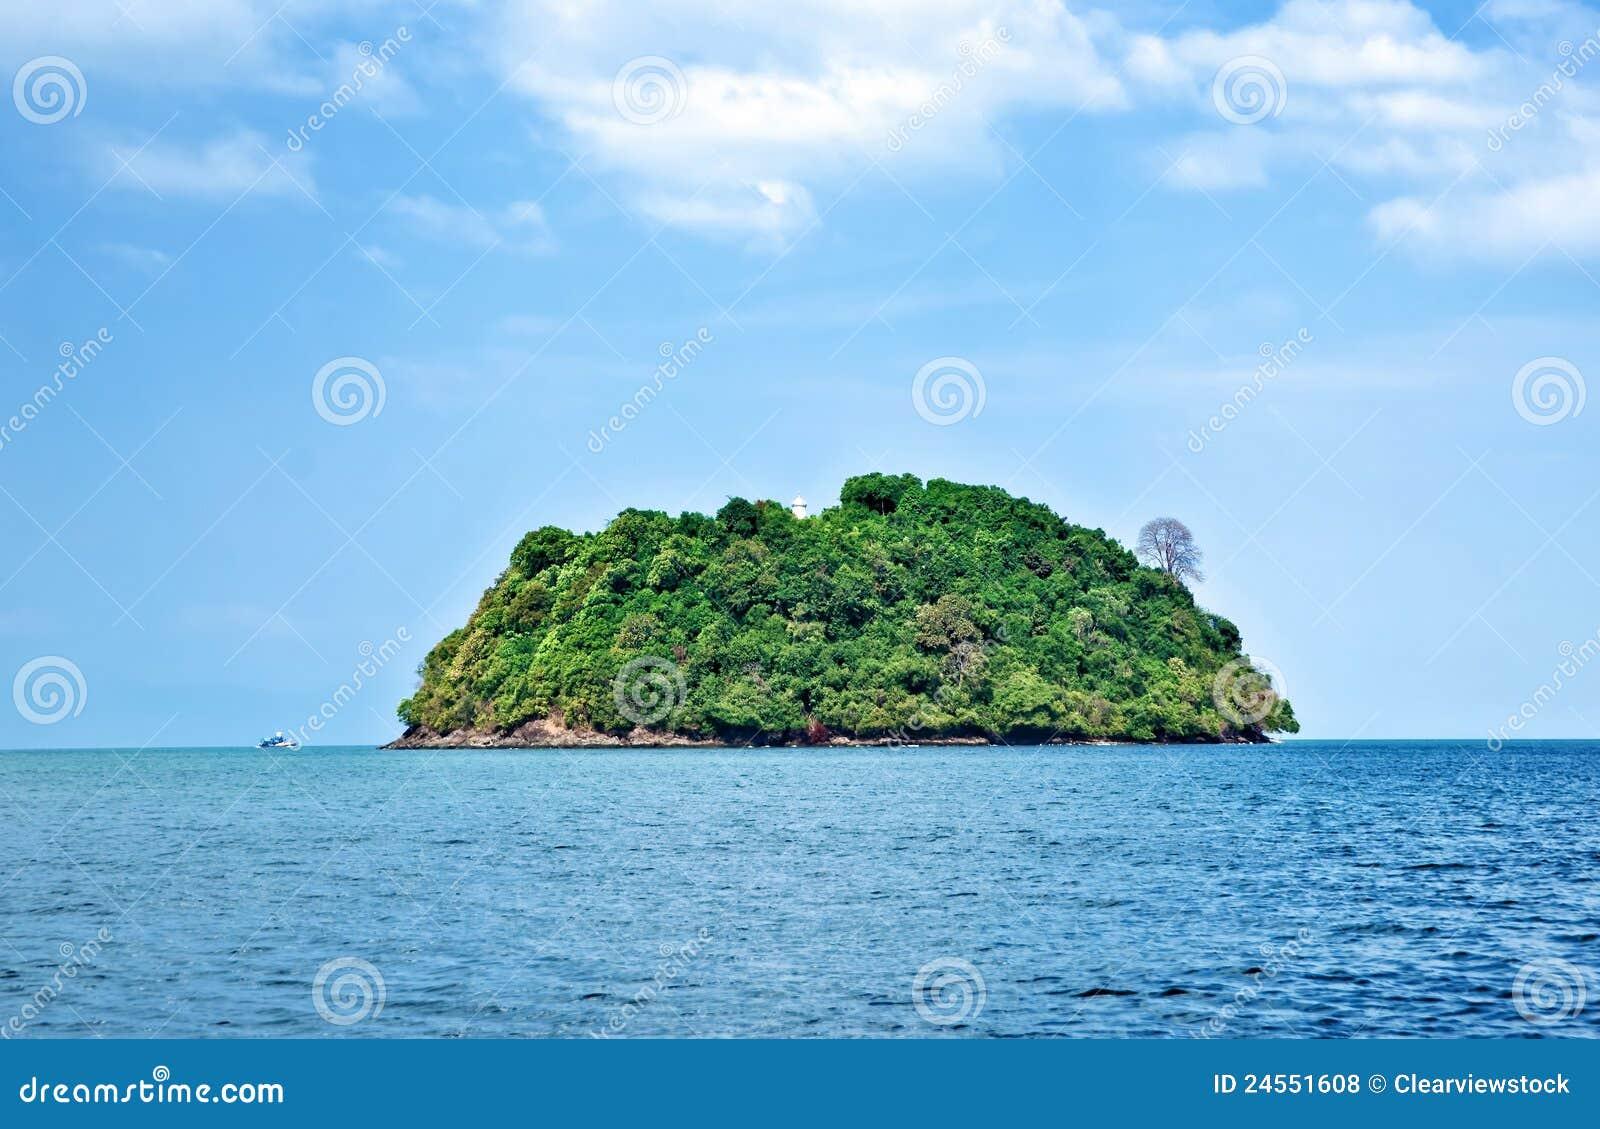 Deserted Tropical Island: Deserted Tropical Island Royalty Free Stock Photos